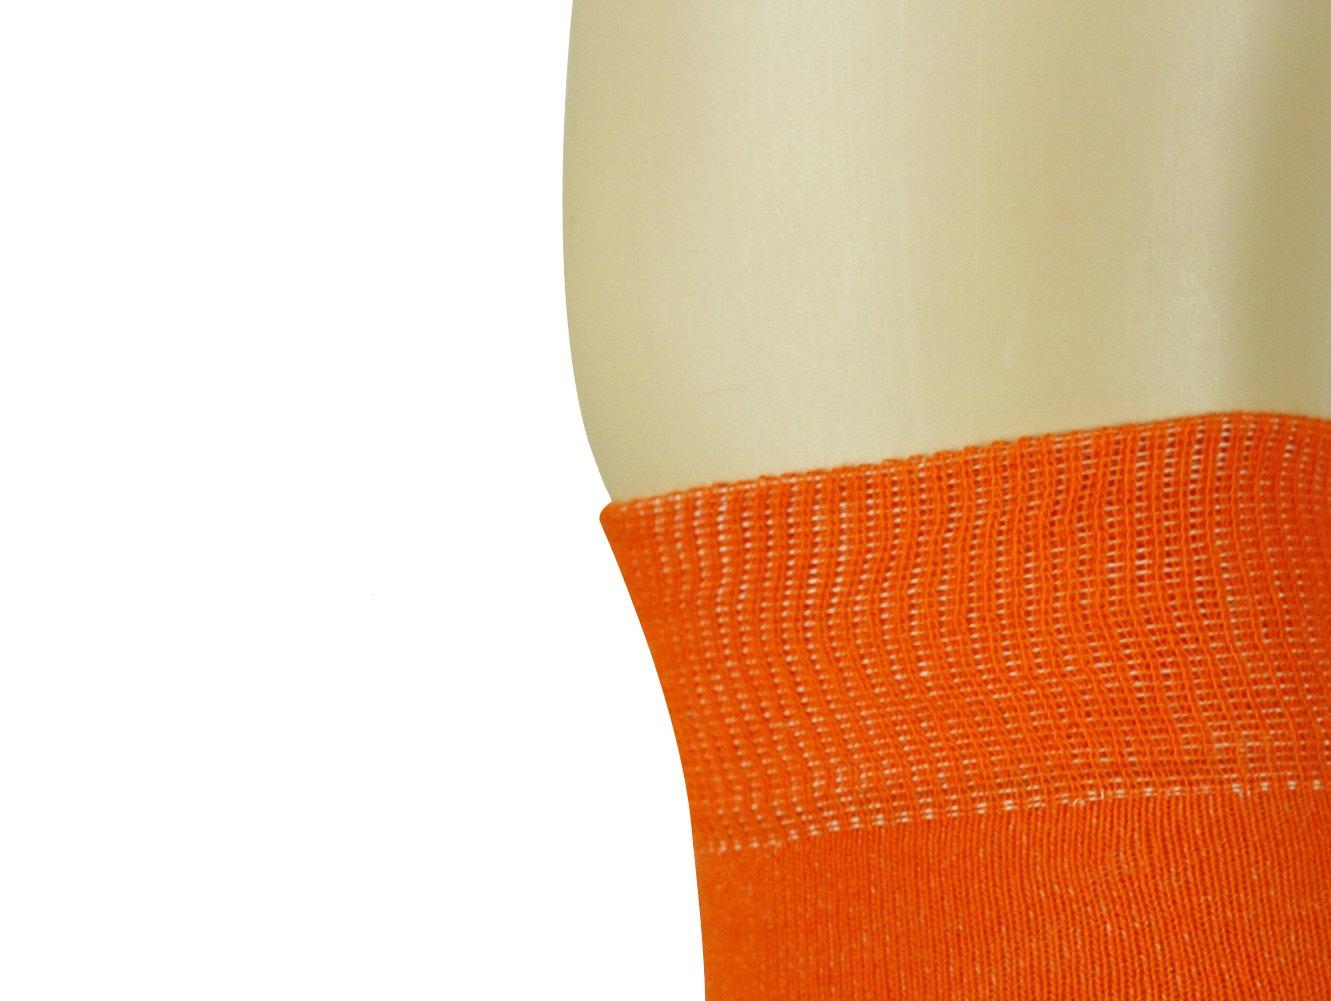 Mysocks Unisex Knee High Long Socks Orange,4-7 by MySocks (Image #4)